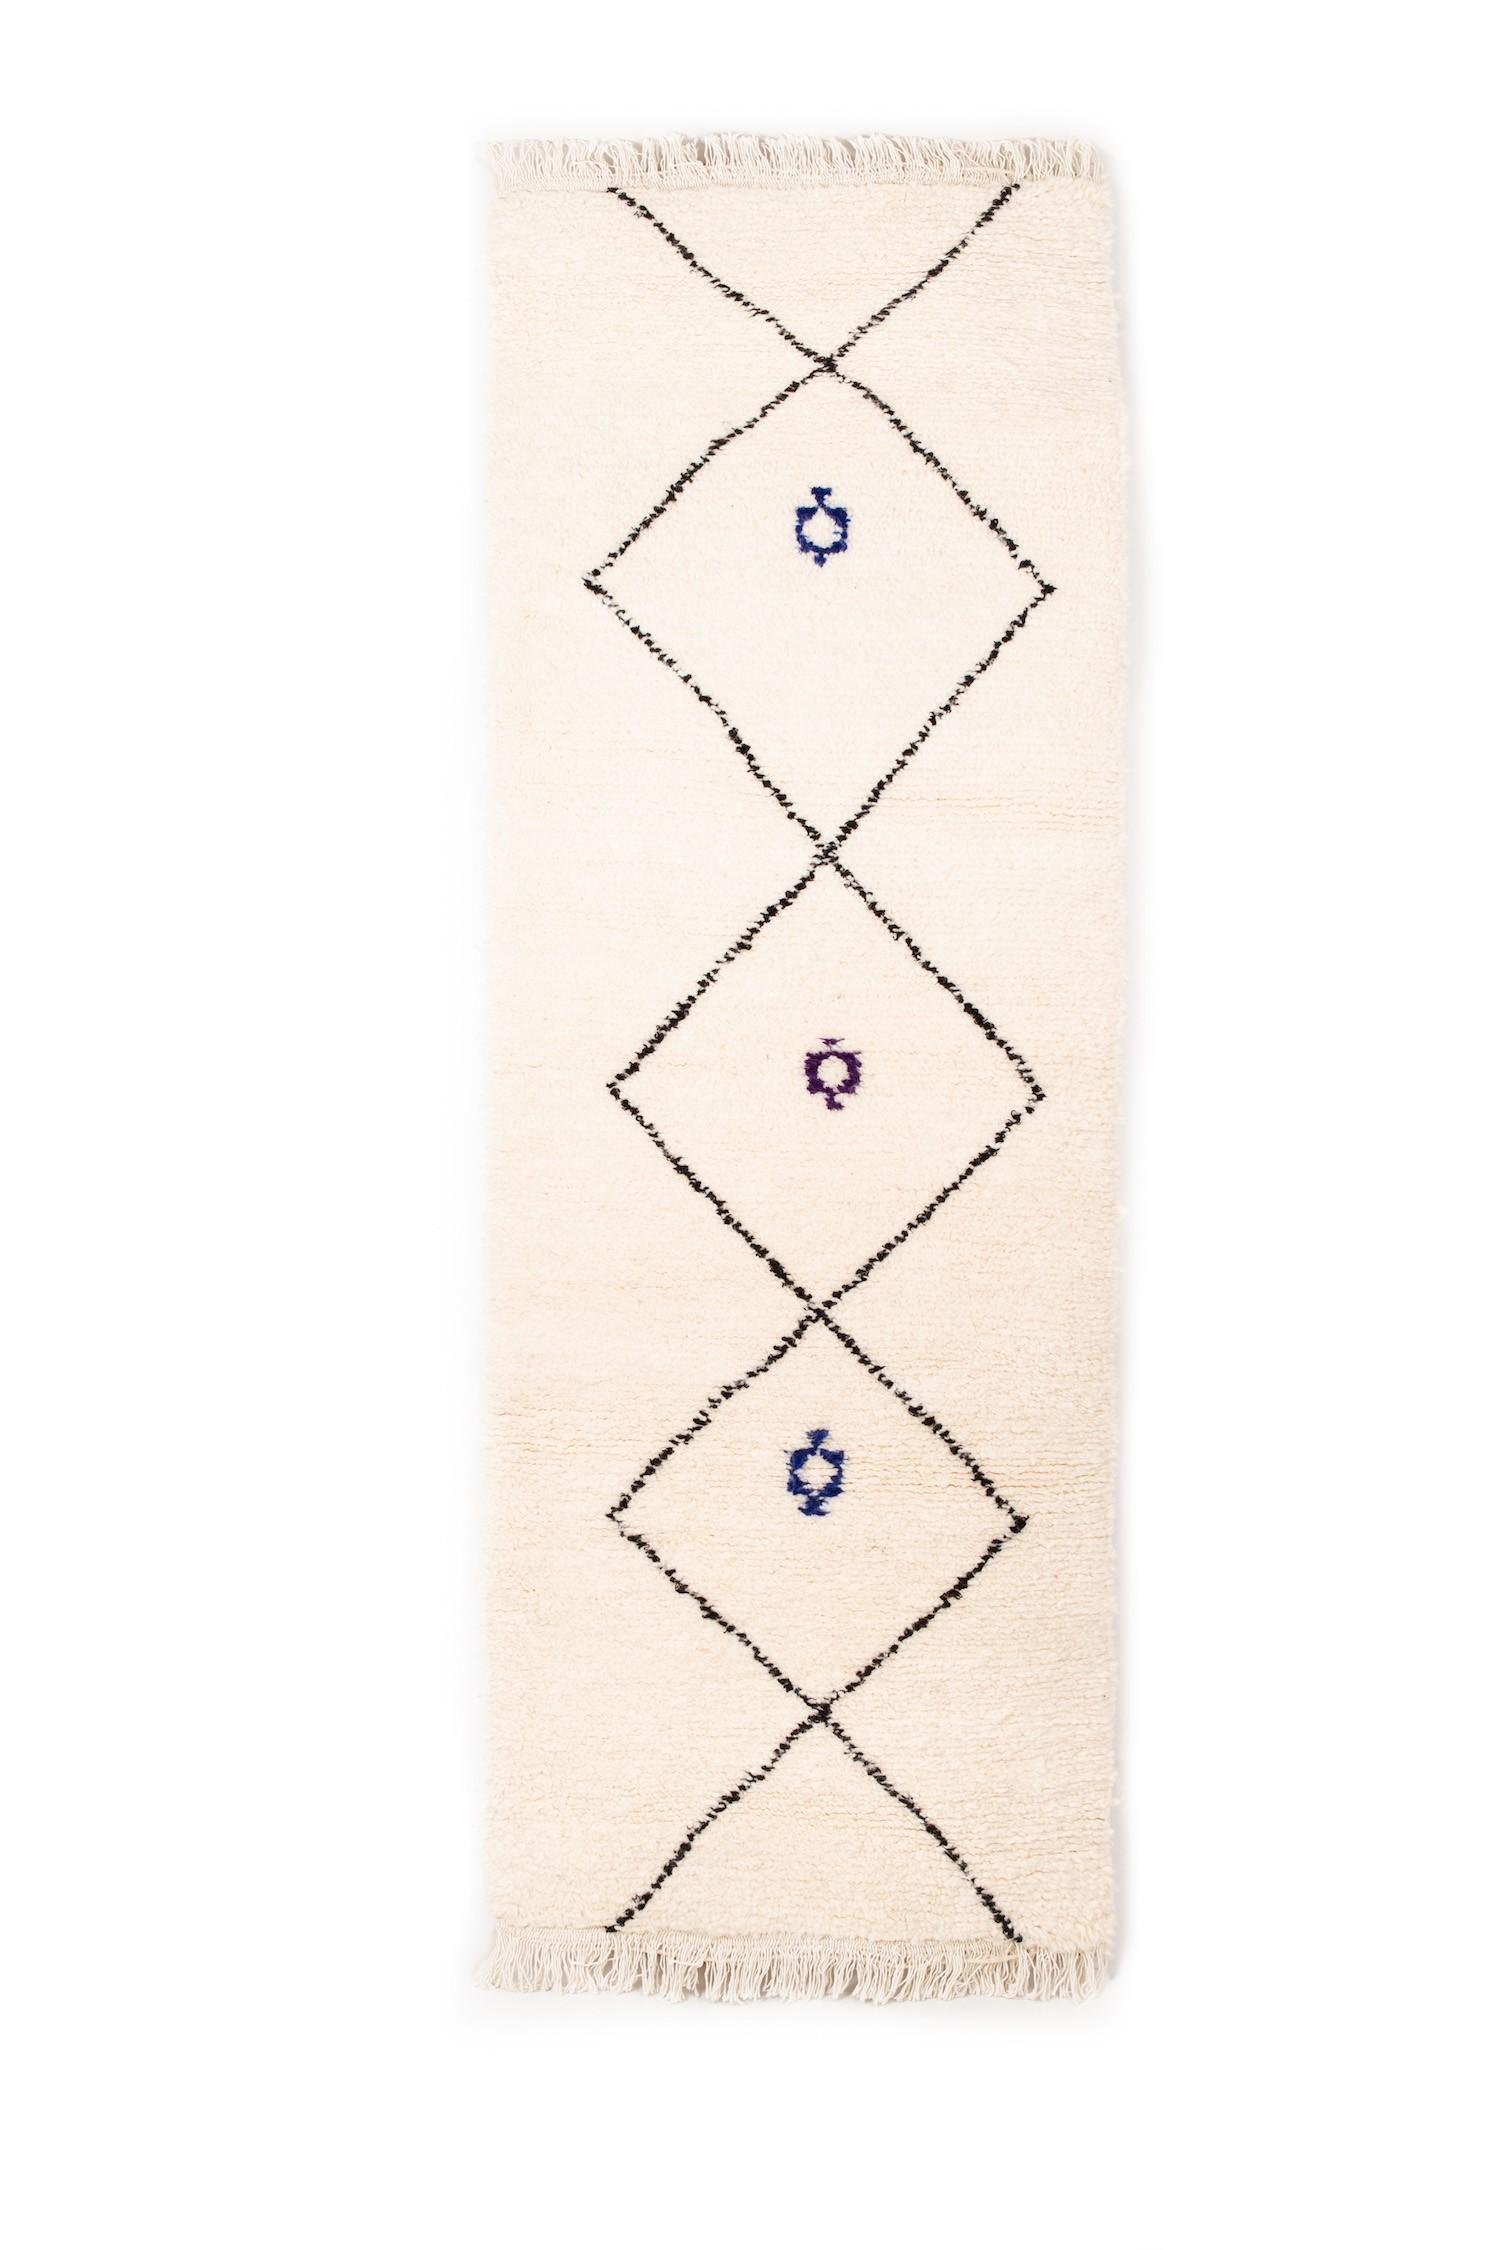 BENI OUARAIN RUG 200 x 80 cm